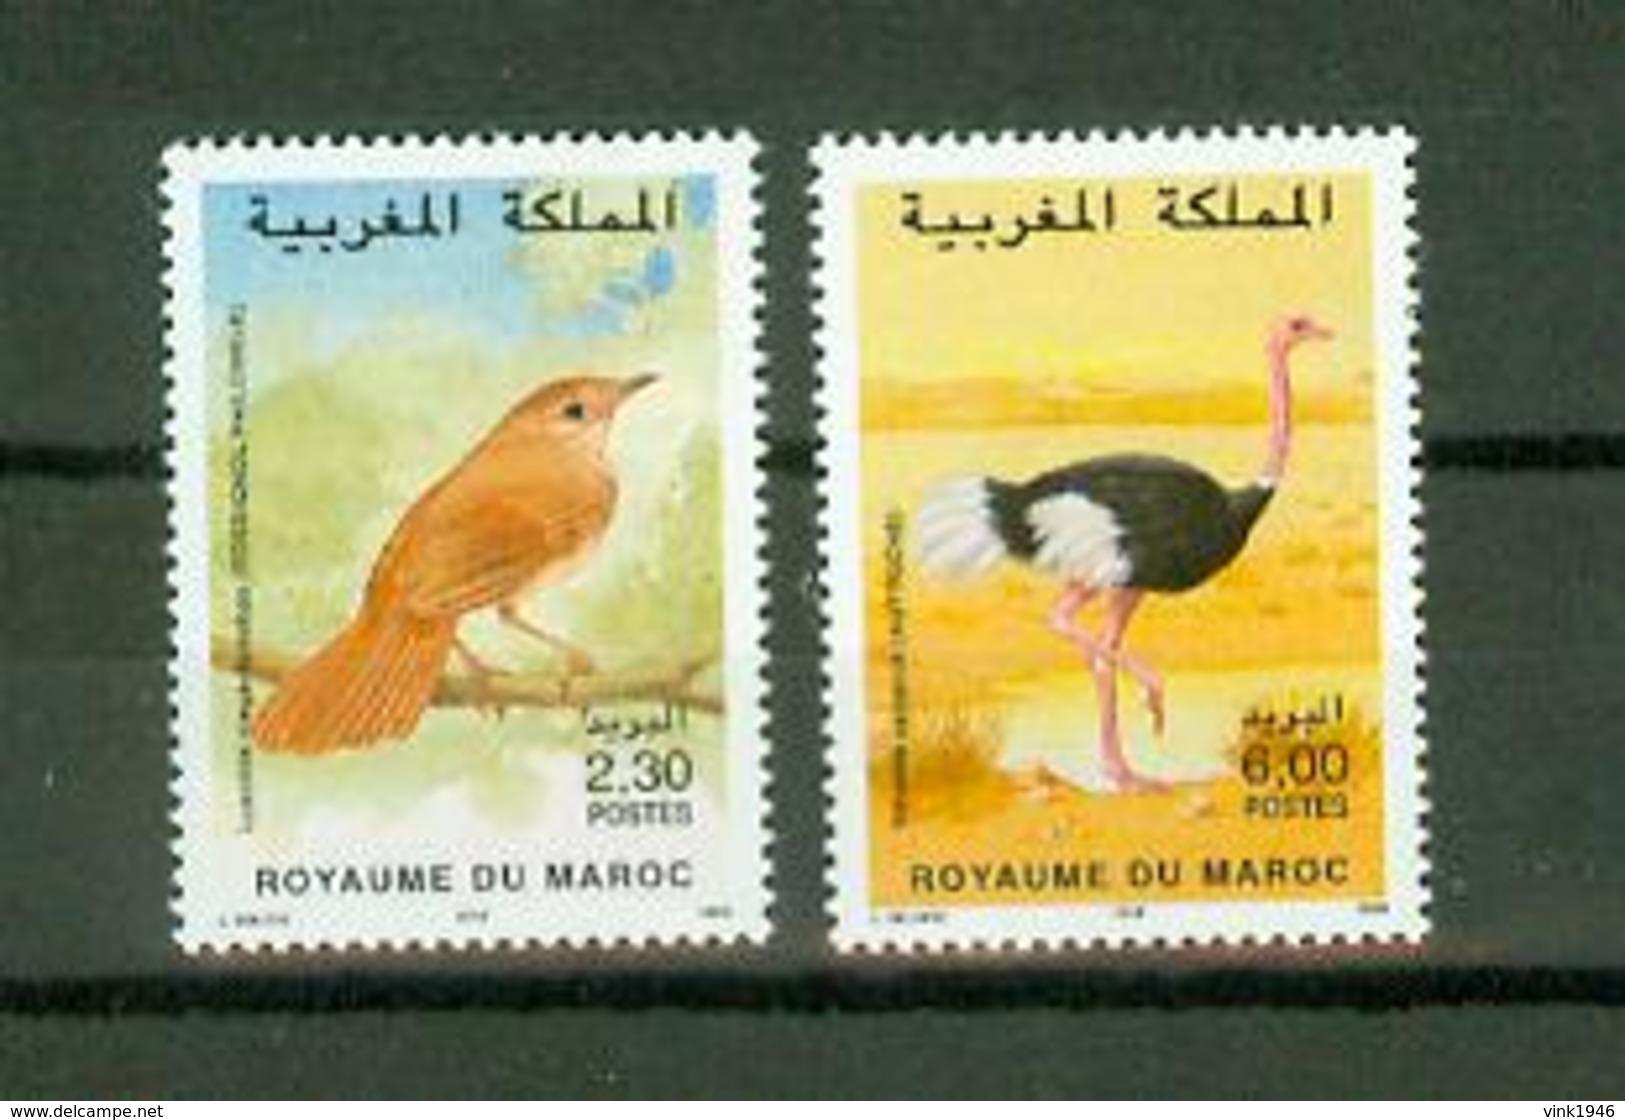 Maroc 1998,2V In Set ,birds,vogels,vögel,oiseaux,pajaros,uccelli,aves,MNH/Postfris(A3638) - Oiseaux